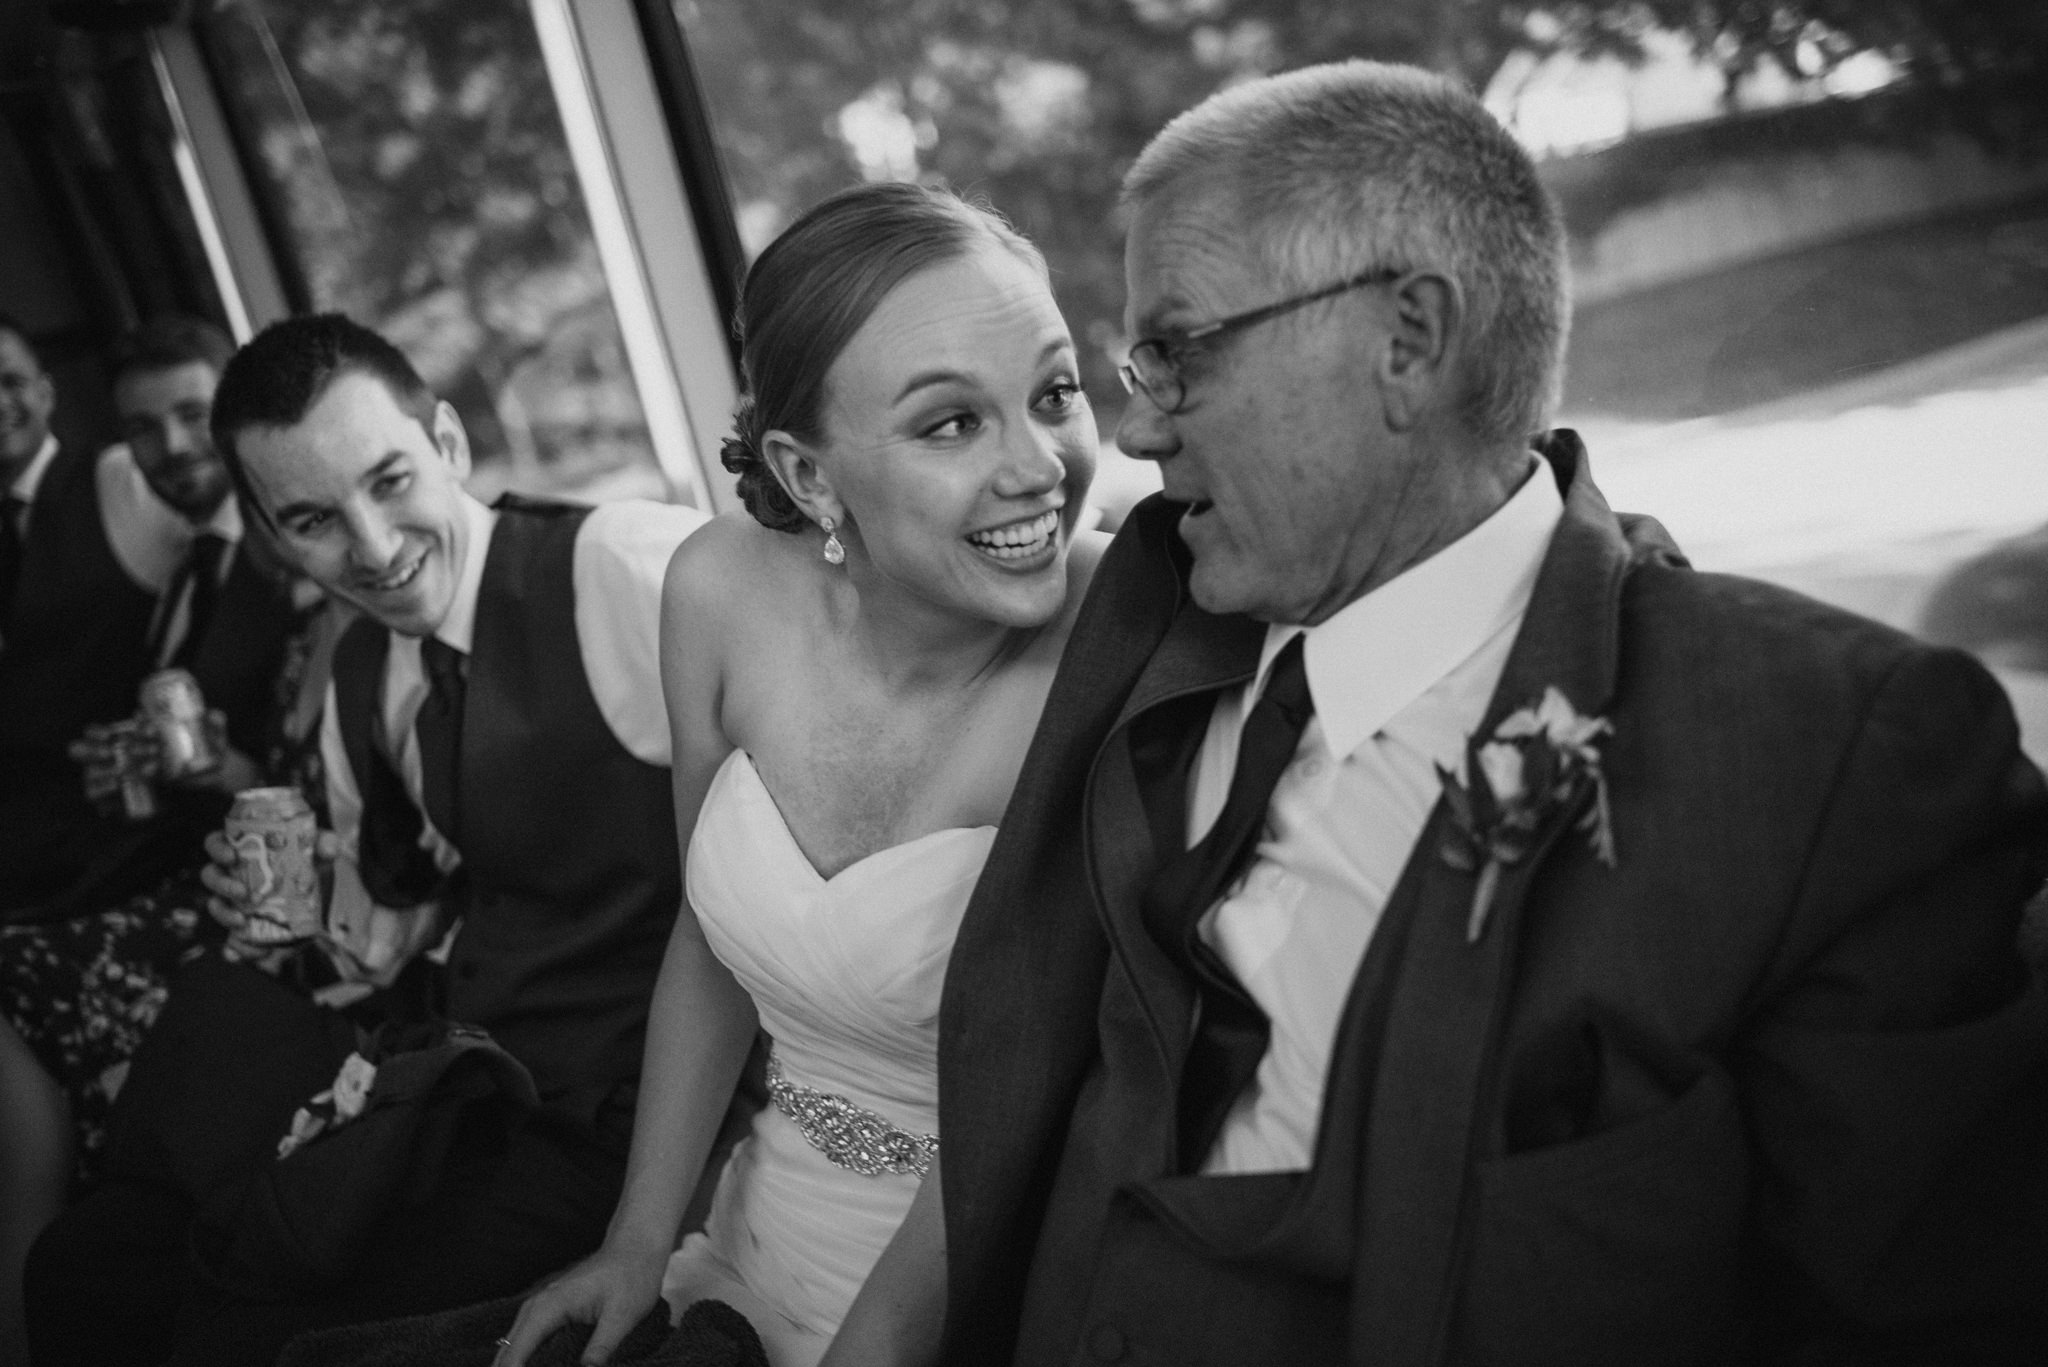 OMAHA-MARRIOTT-WEDDING-DOWNTOWN-MARRIOTT-OMAHA-WEDDING-PHOTOGRAPHER-JM-STUDIOS-024.jpg